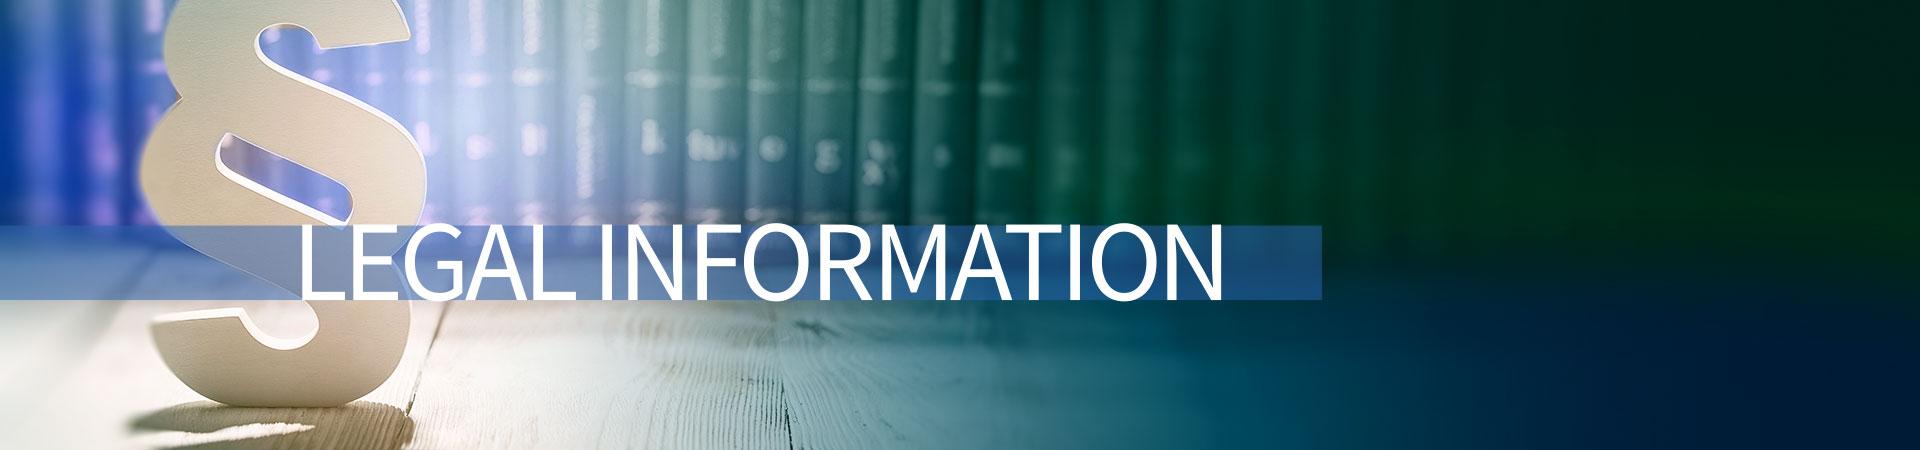 Legal-information